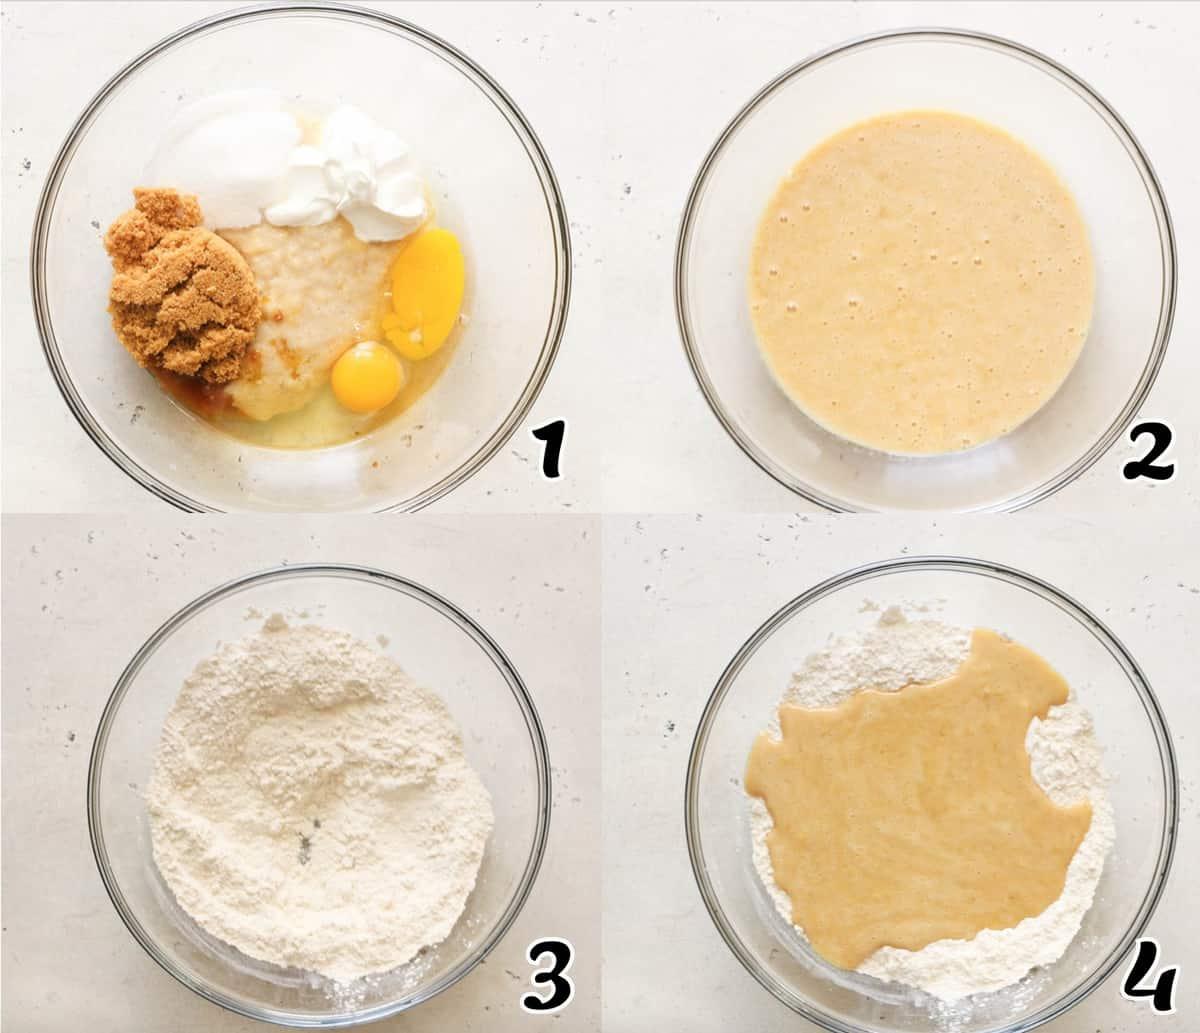 Strawberry Banana Bread Steps 1-4